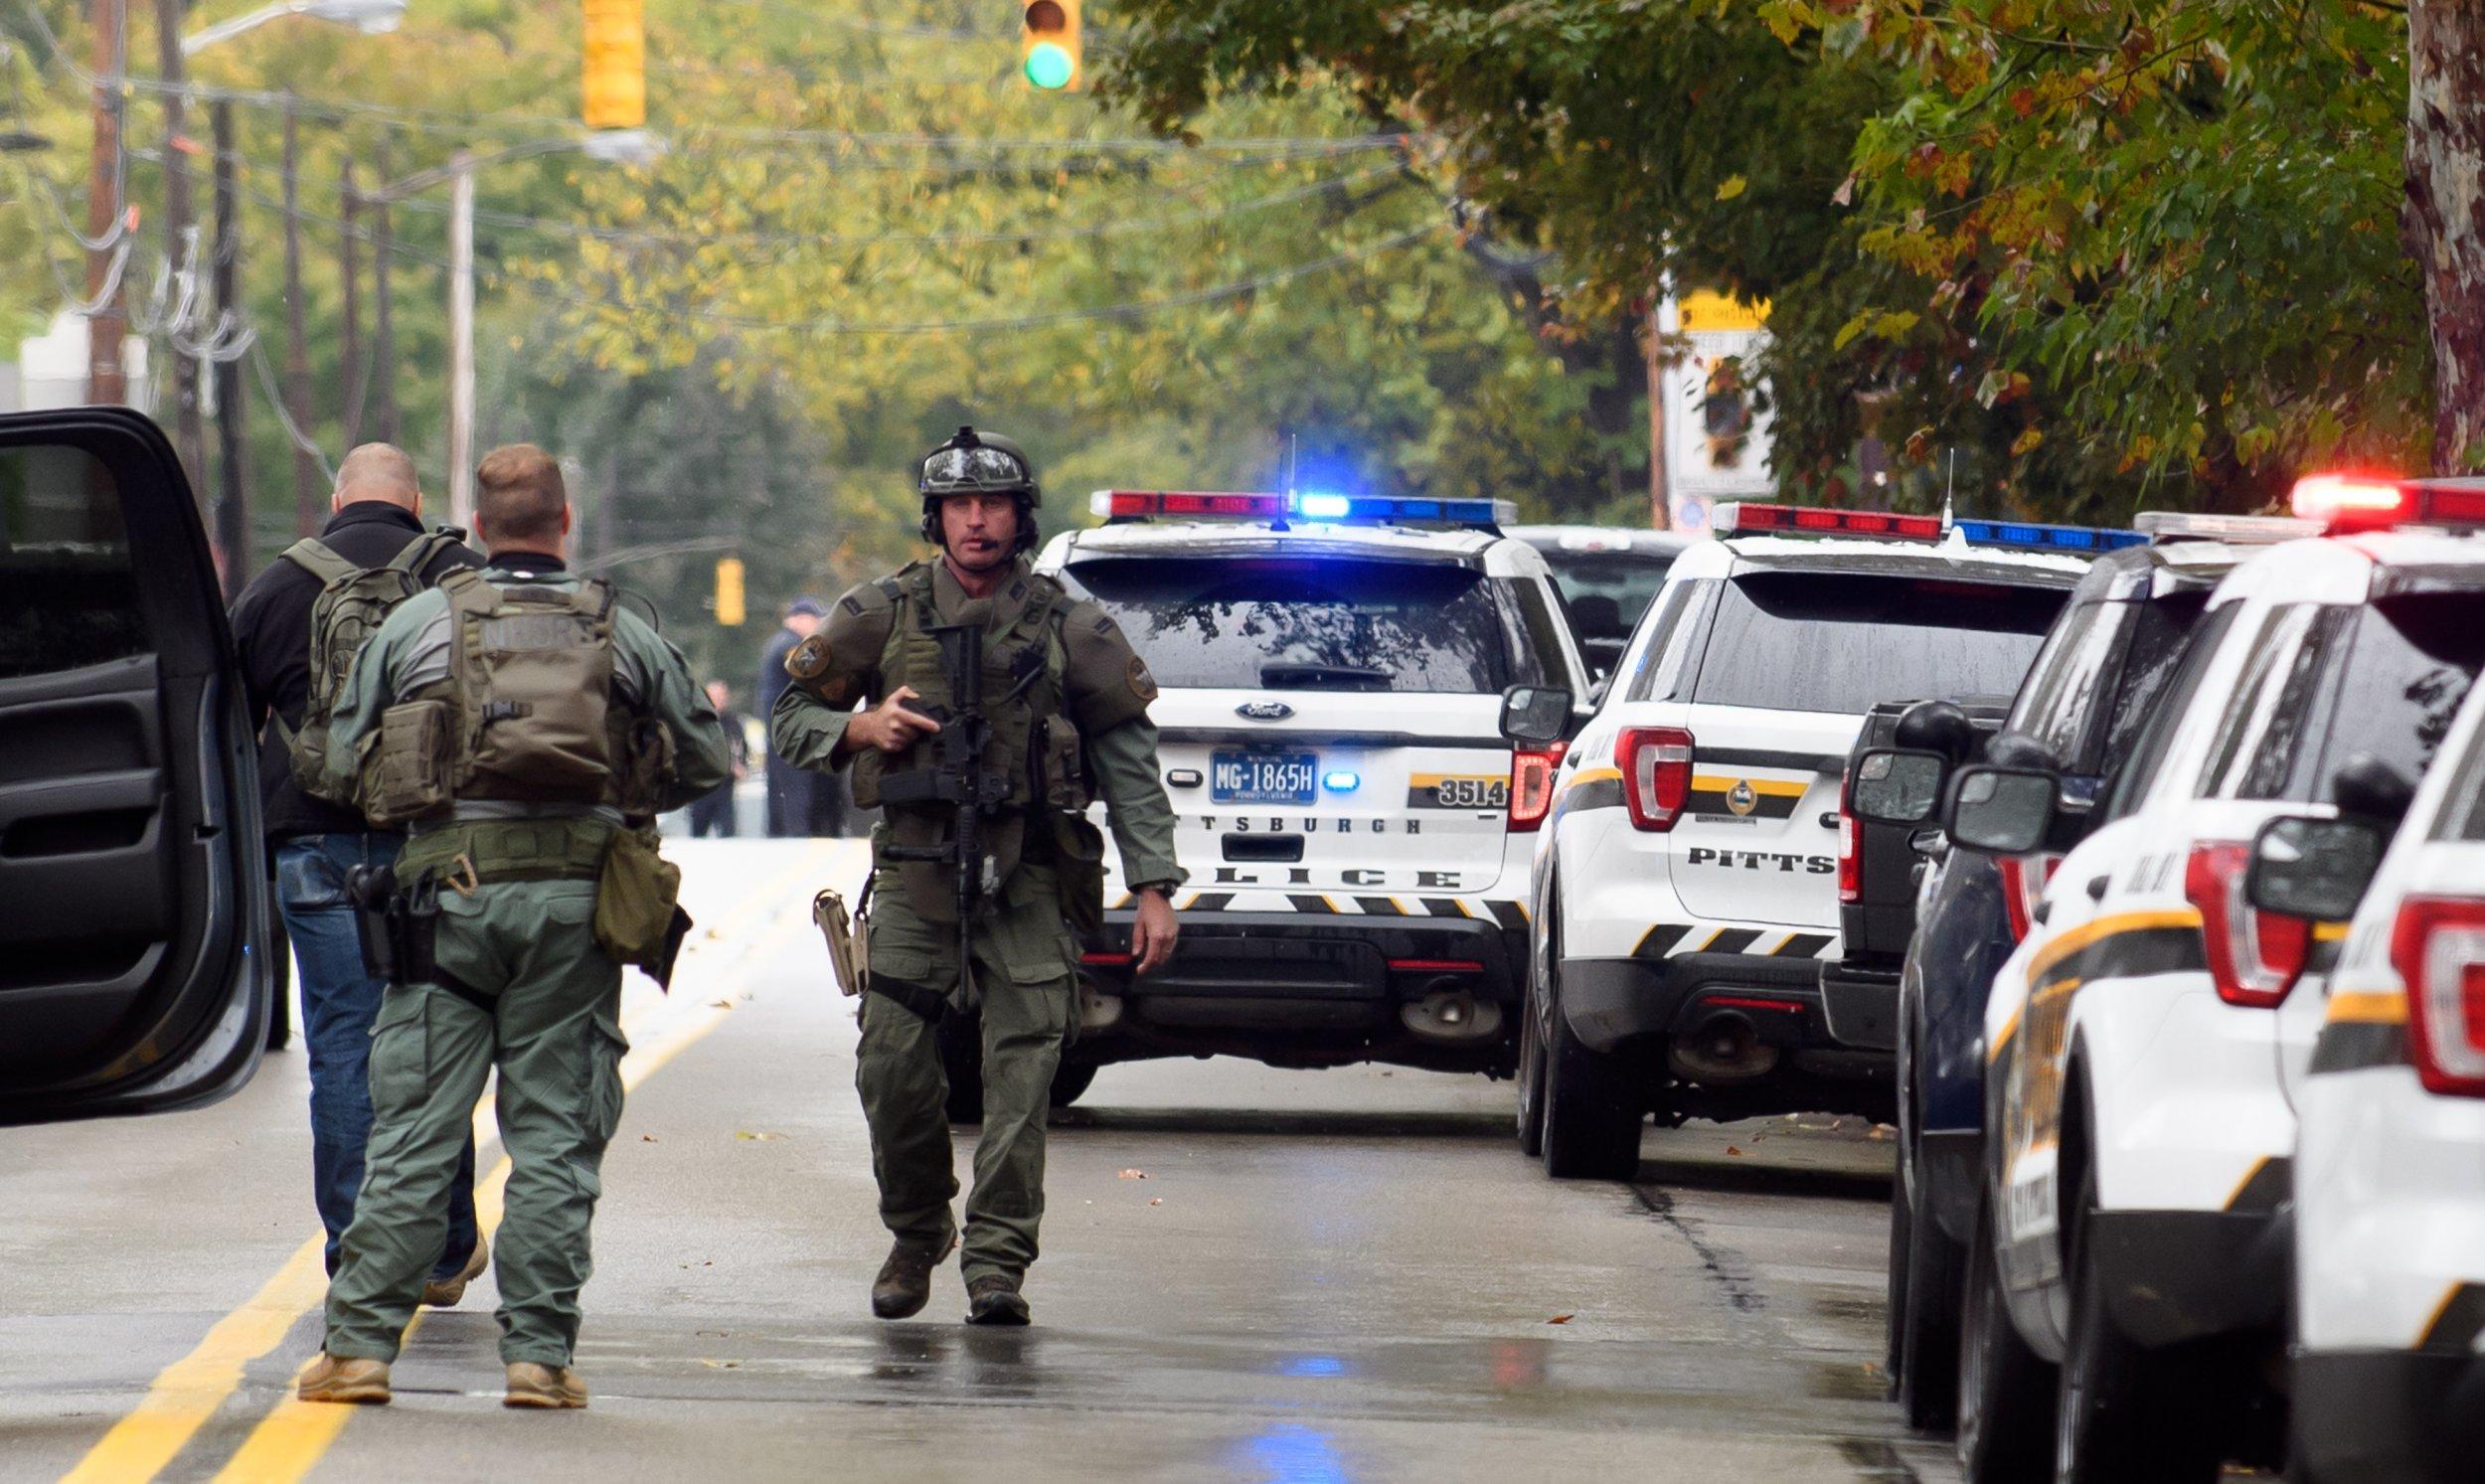 pittsburgh shooting, Robert Bowers Gab, anti-semitic